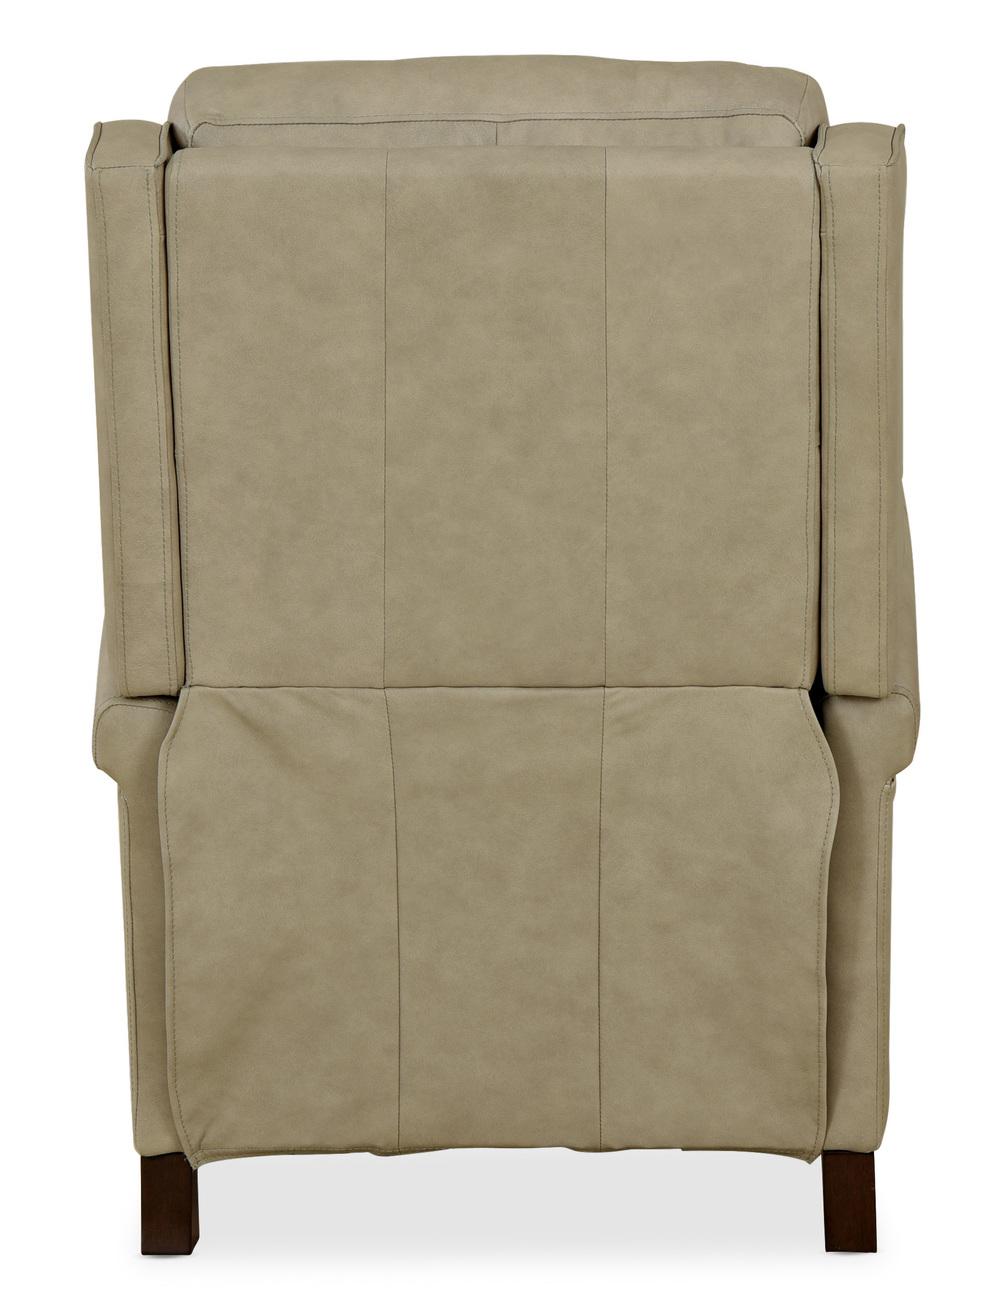 Hooker Furniture - Rankin Power Recliner w/ Power Headrest